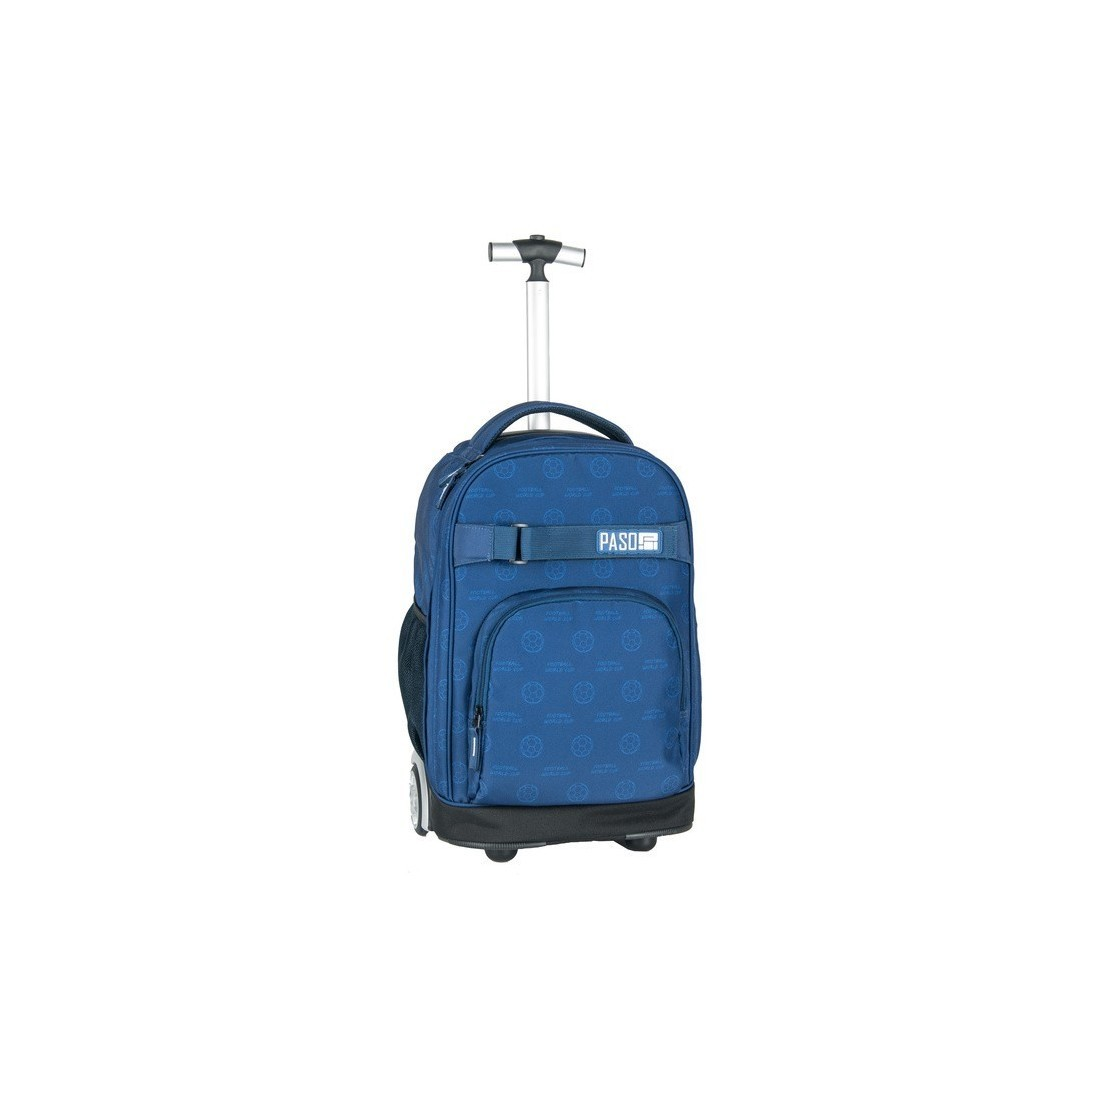 0c989001d0ce8 Plecak na kółkach Paso Dark Blue football niebieski dla chłopaka ...